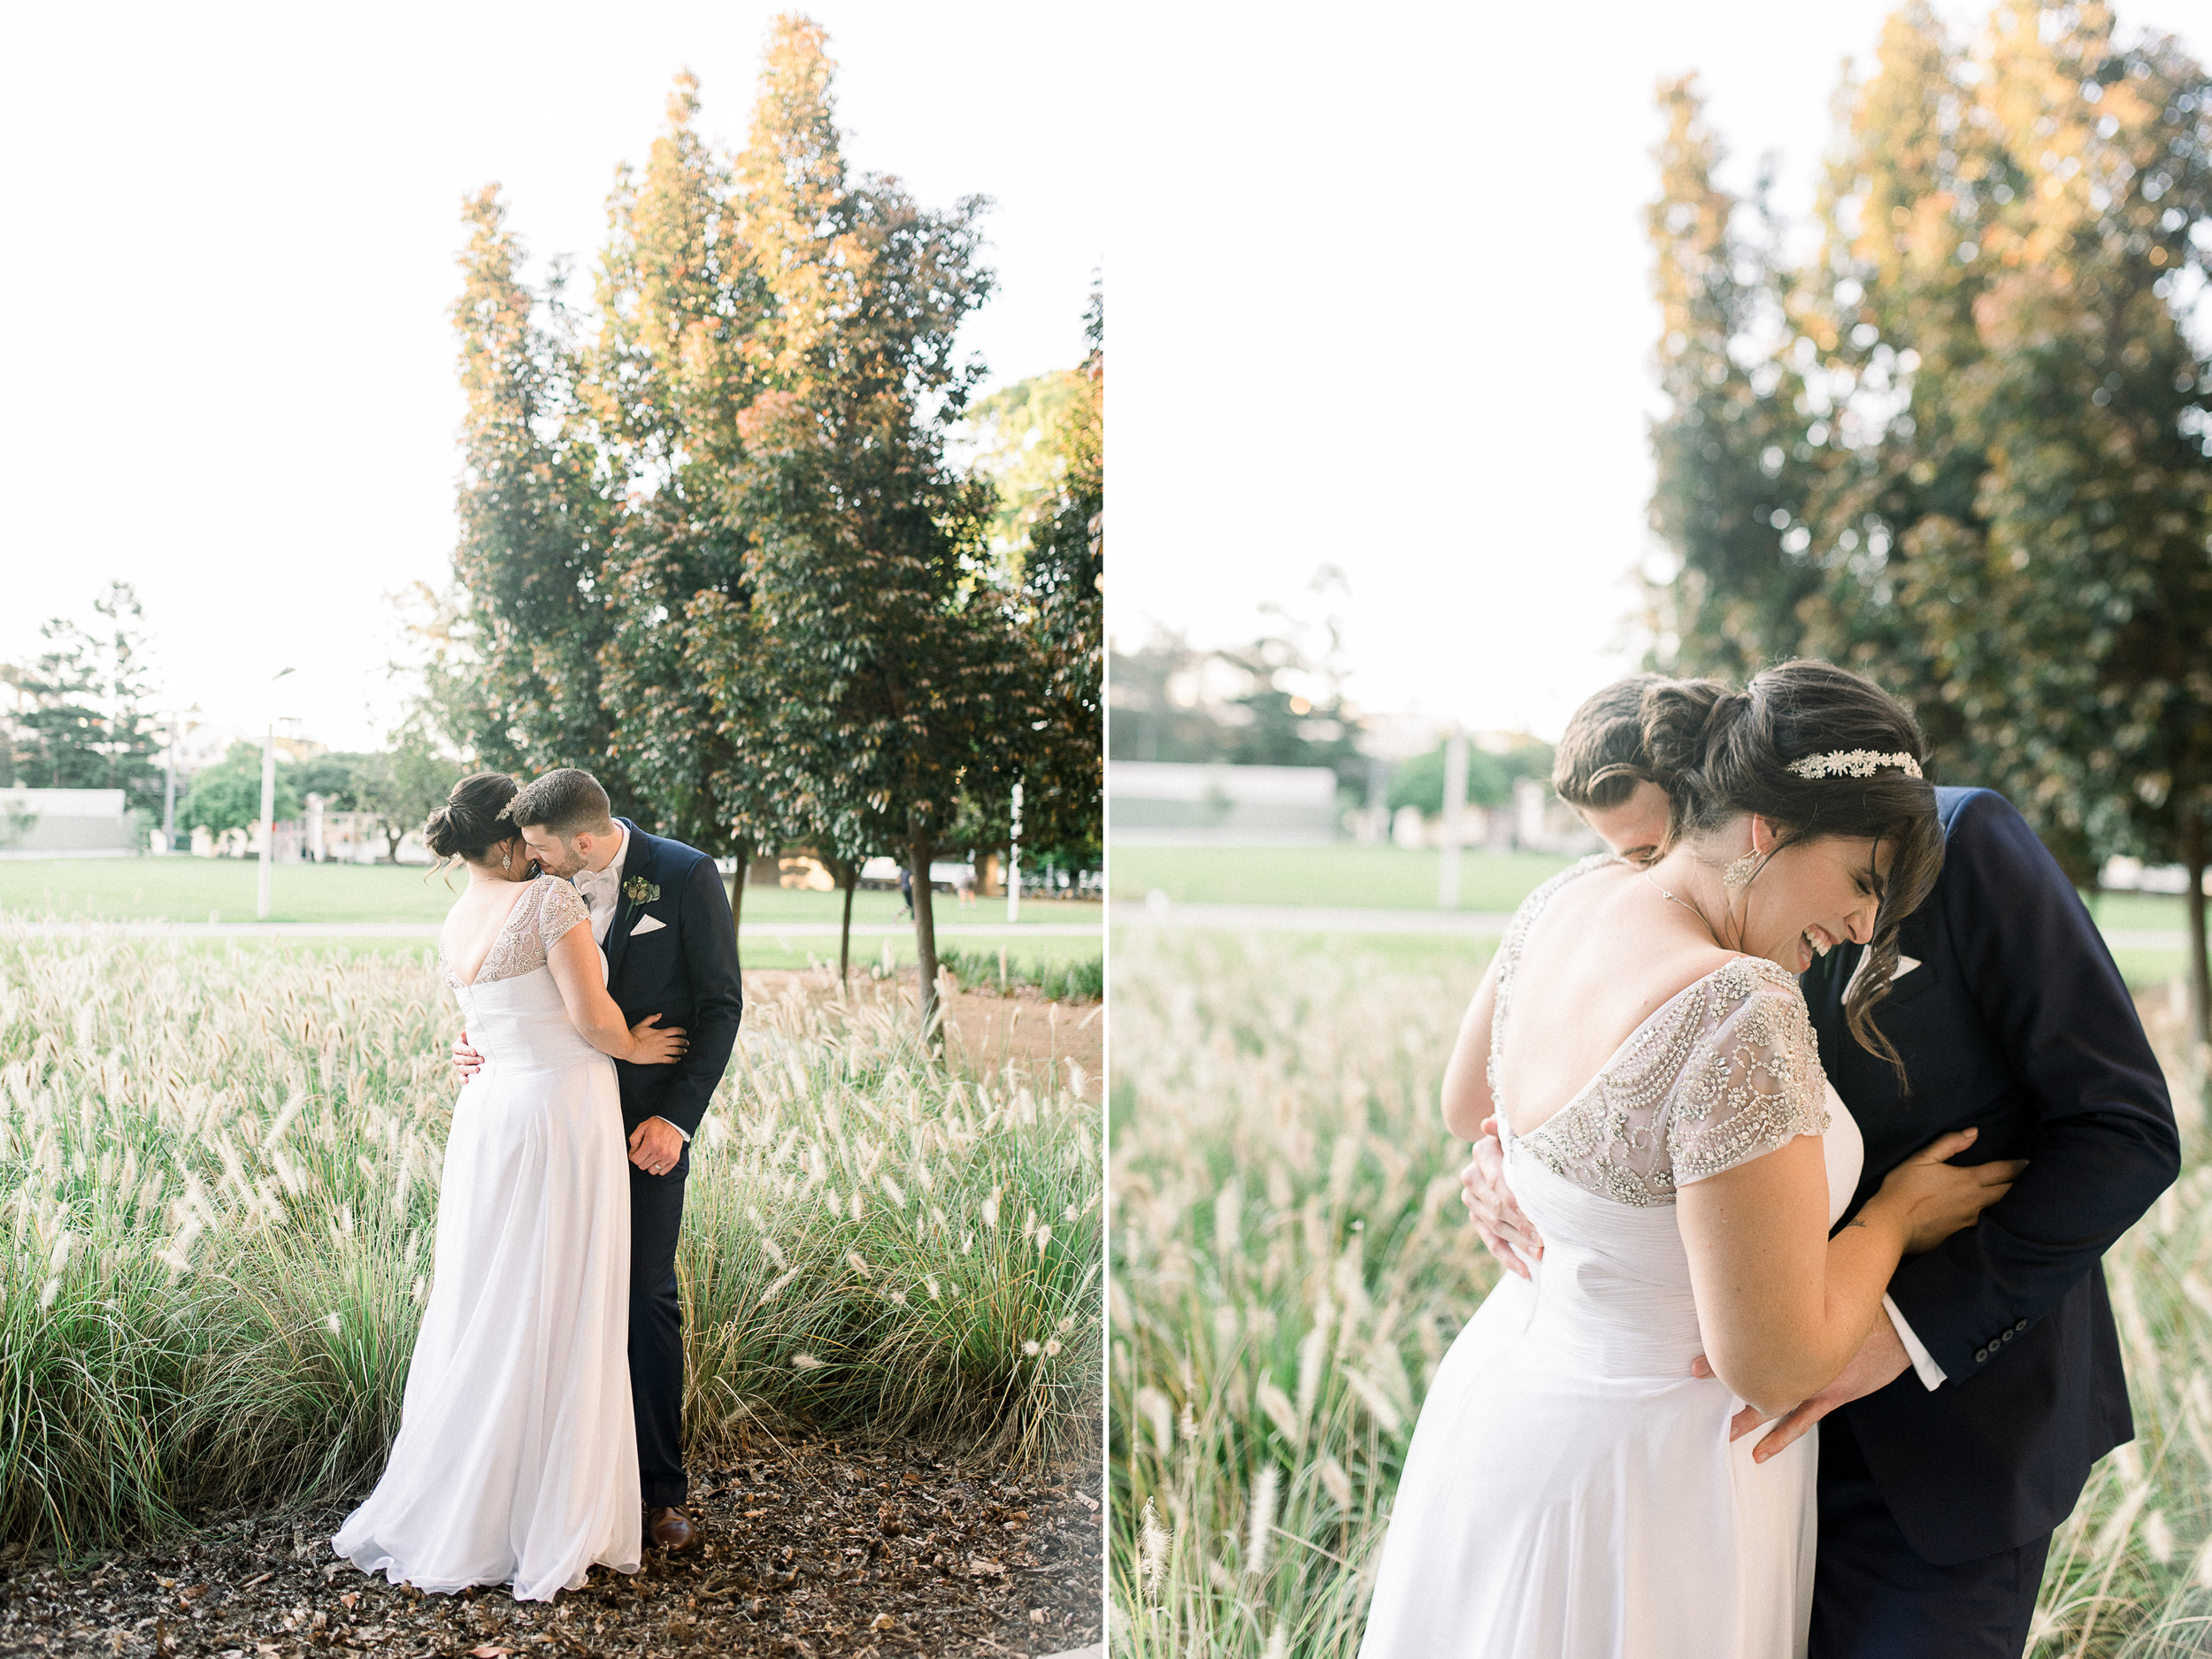 brisbane-city-wedding-photography-film-light-beautiful-2.jpg